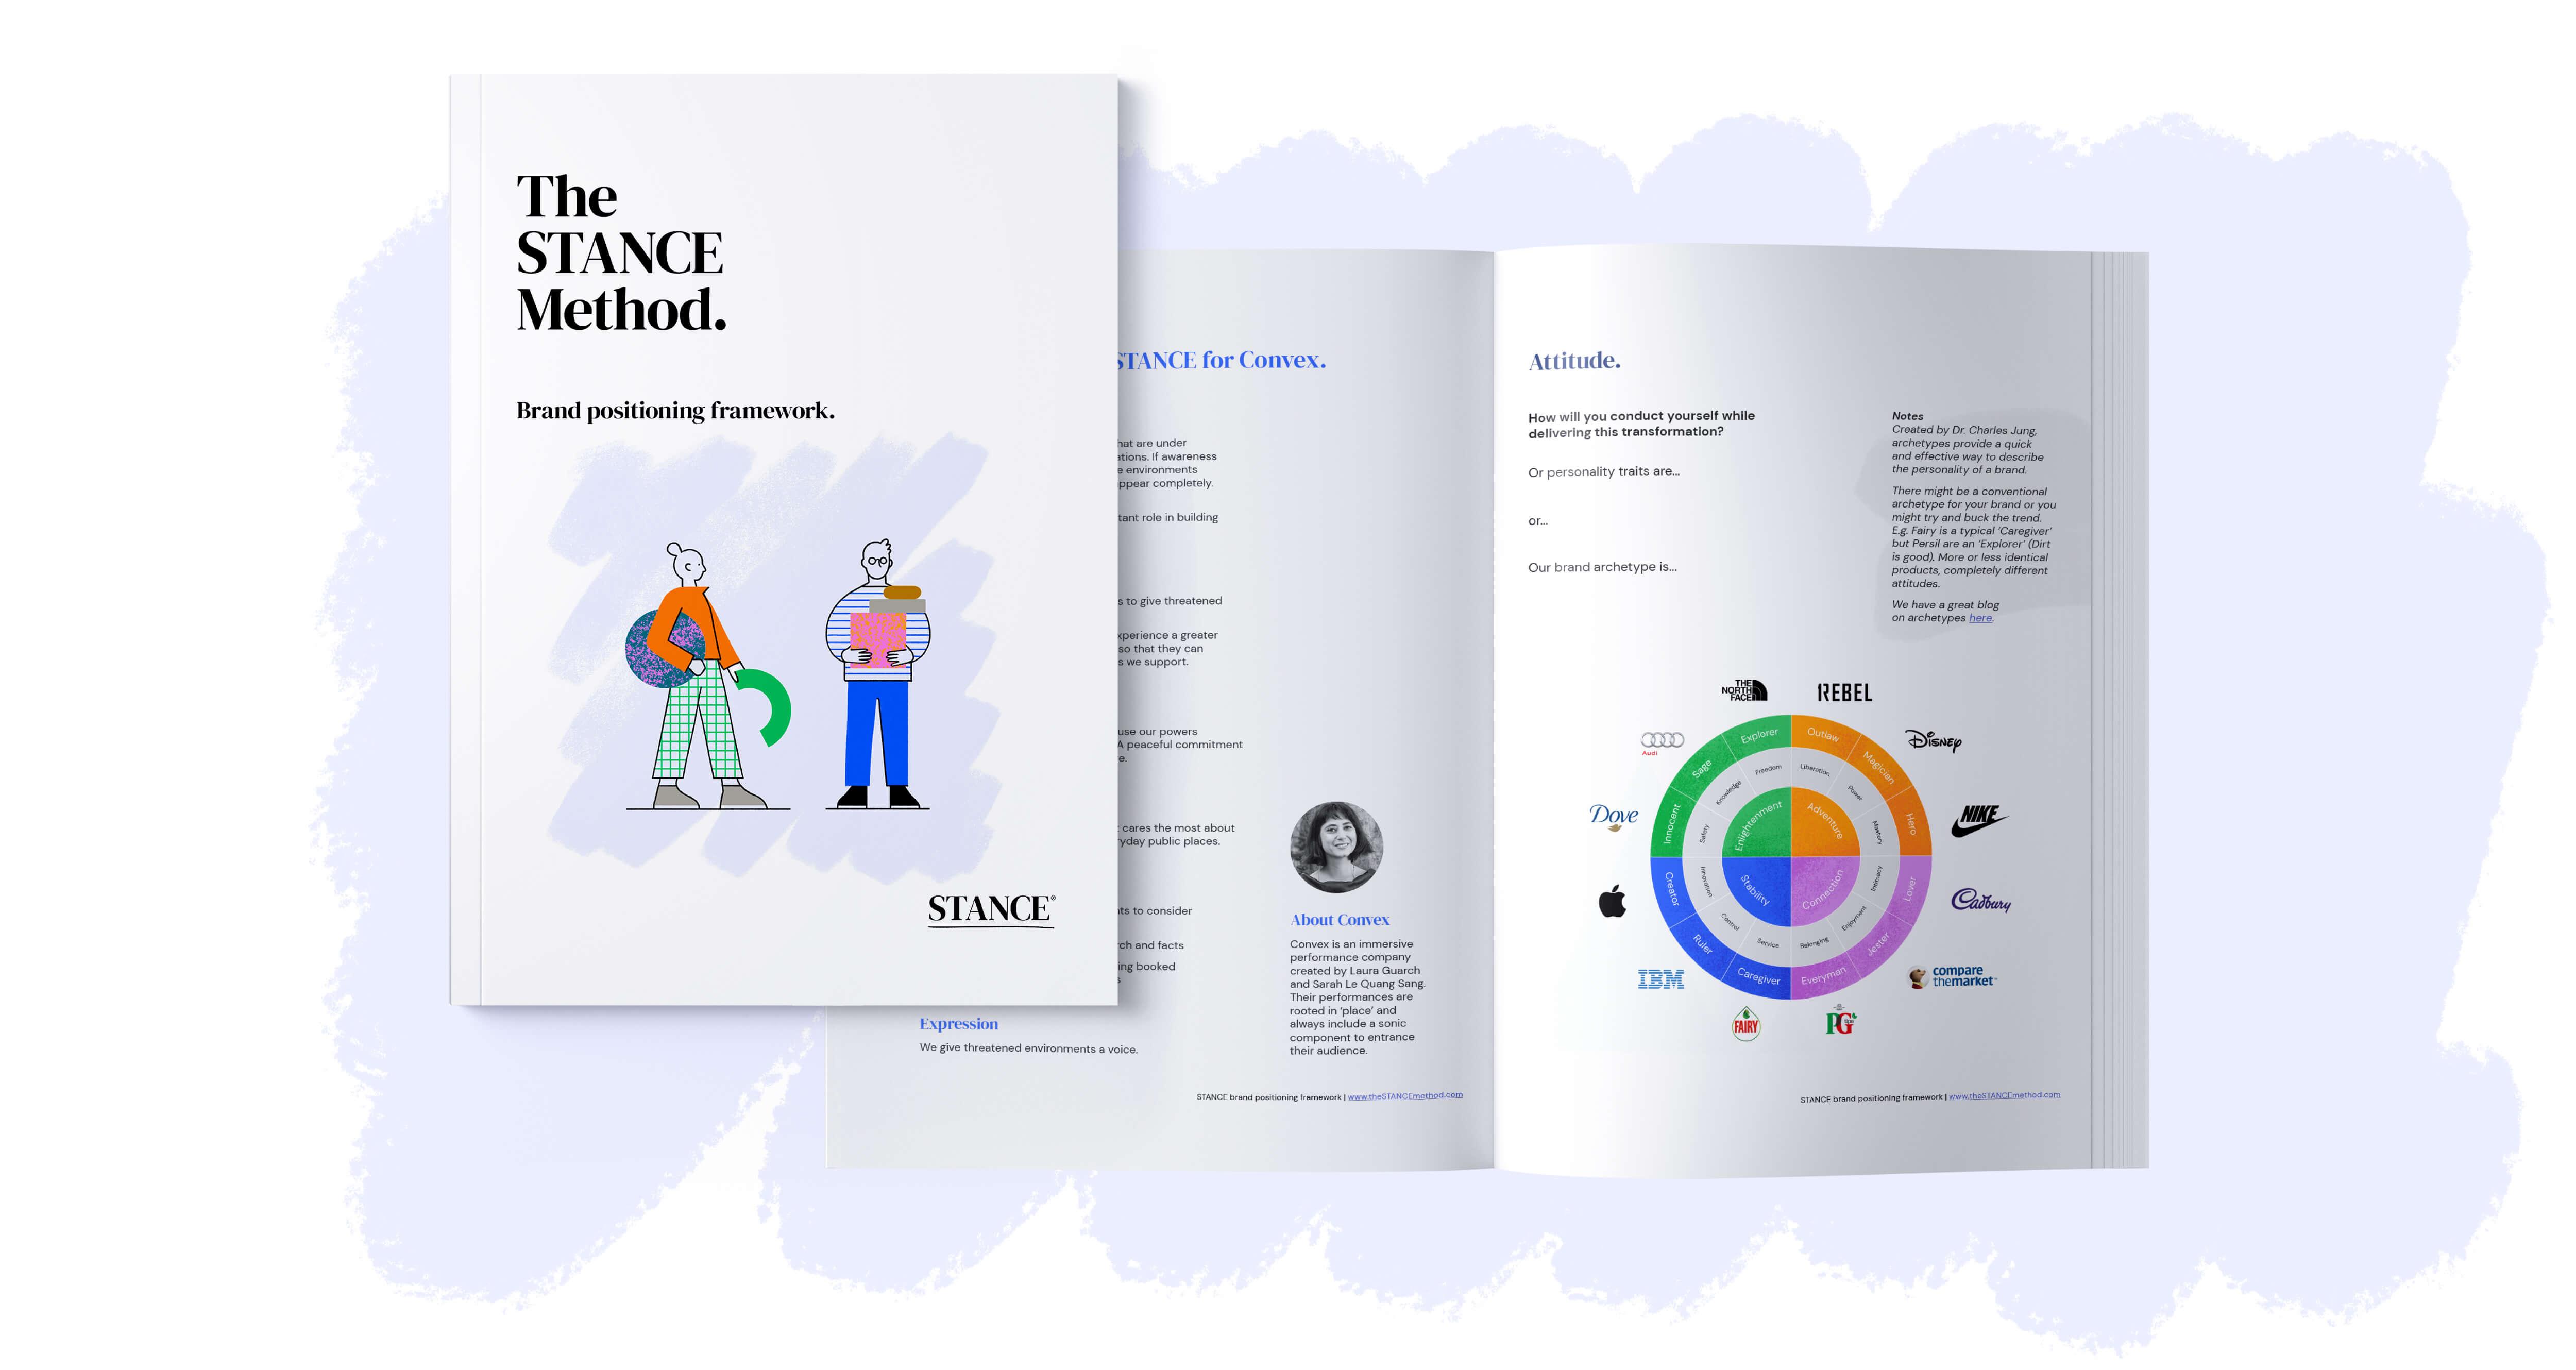 STANCE Framework